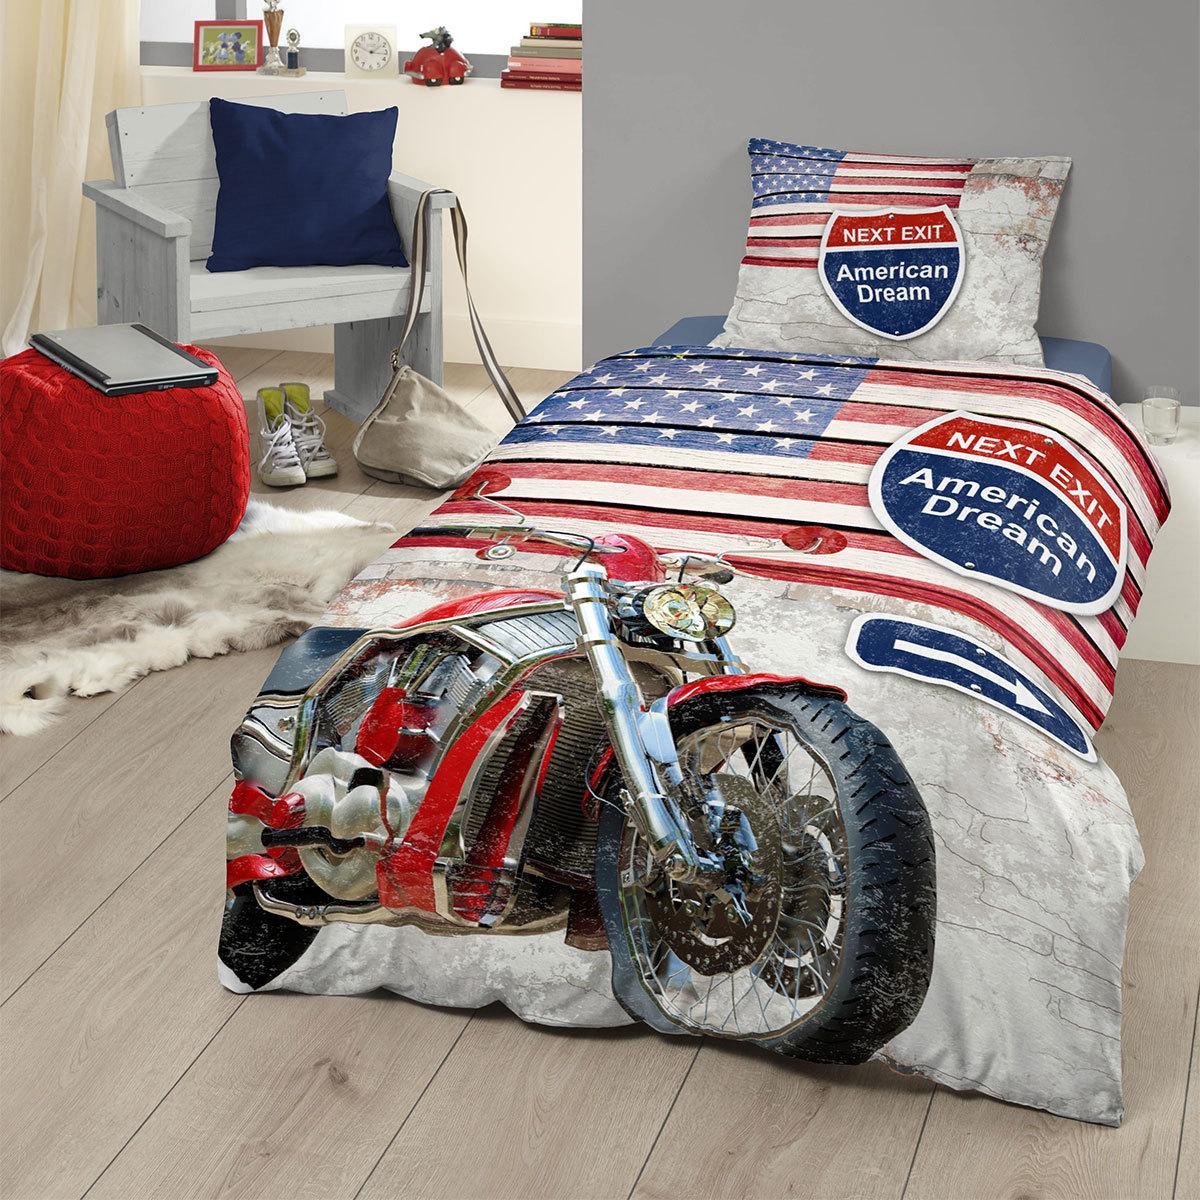 Good Morning Bettwäsche American